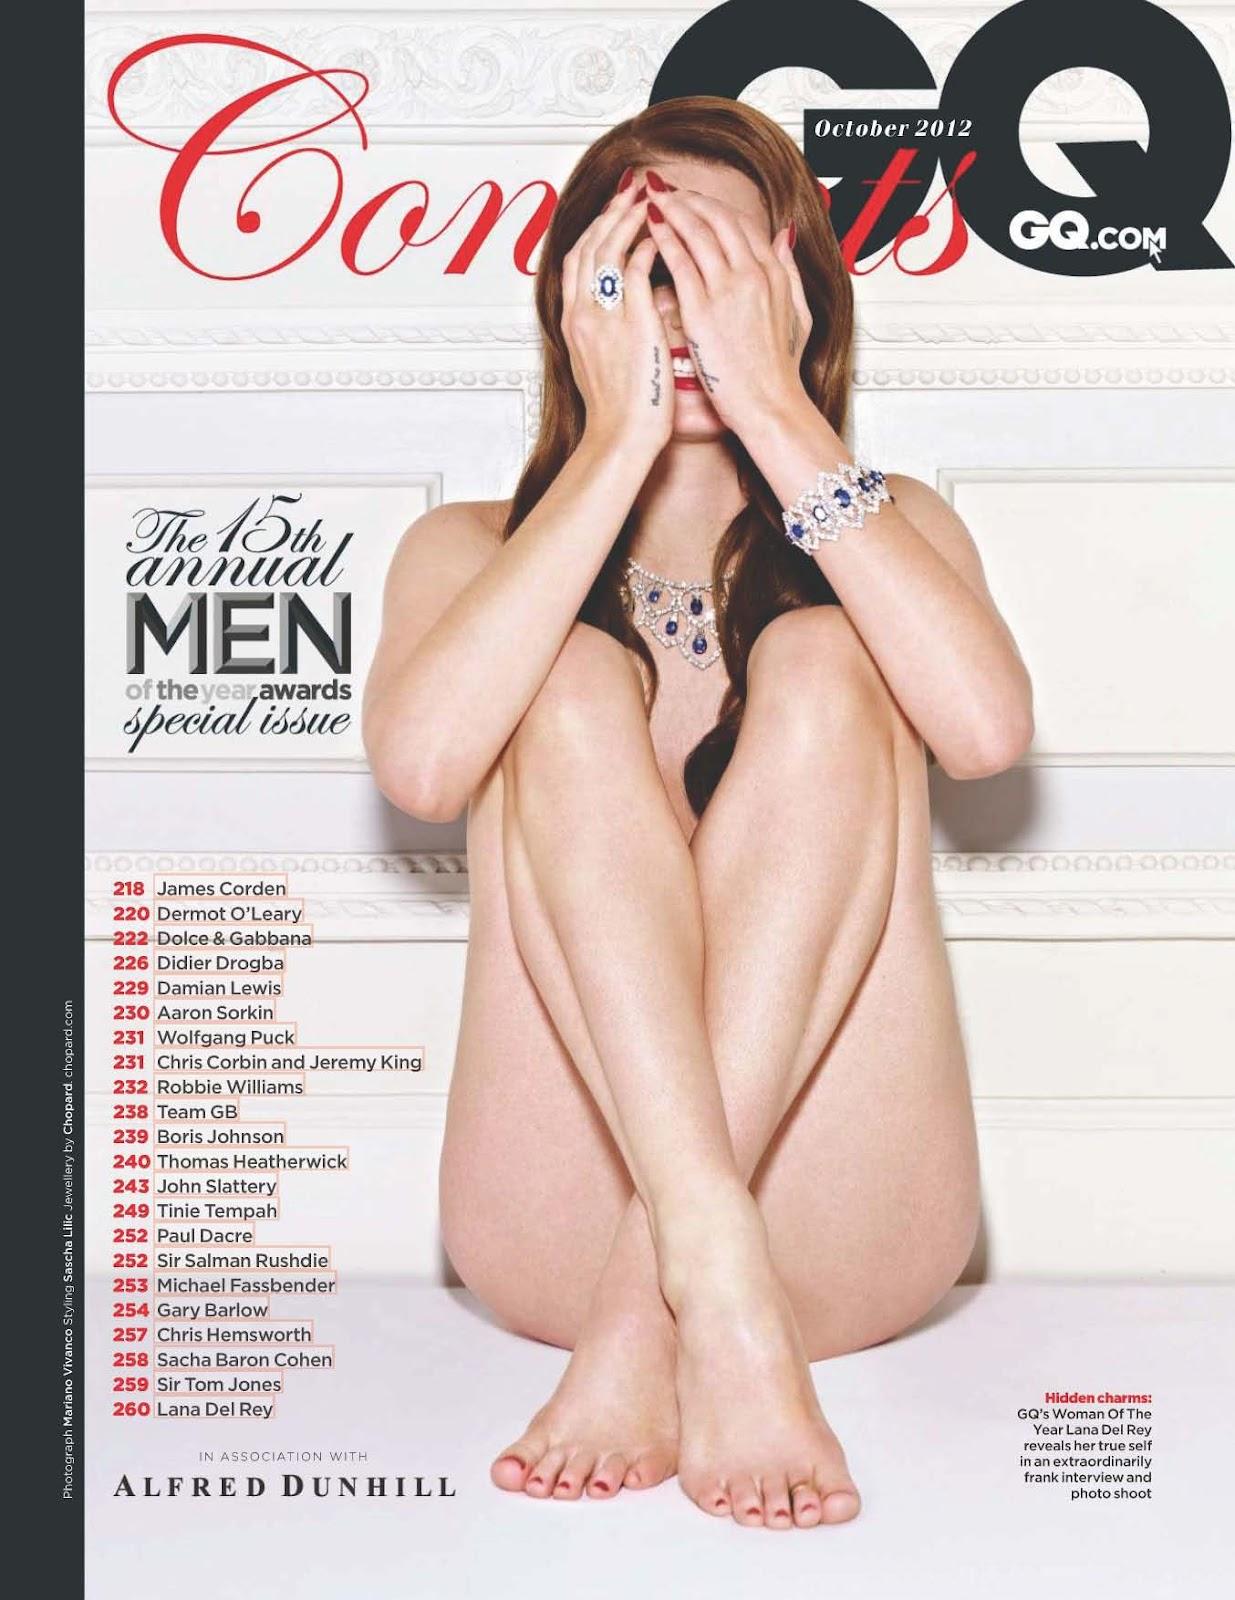 Bikini Vanessa Del Rey Nude Photos Pics